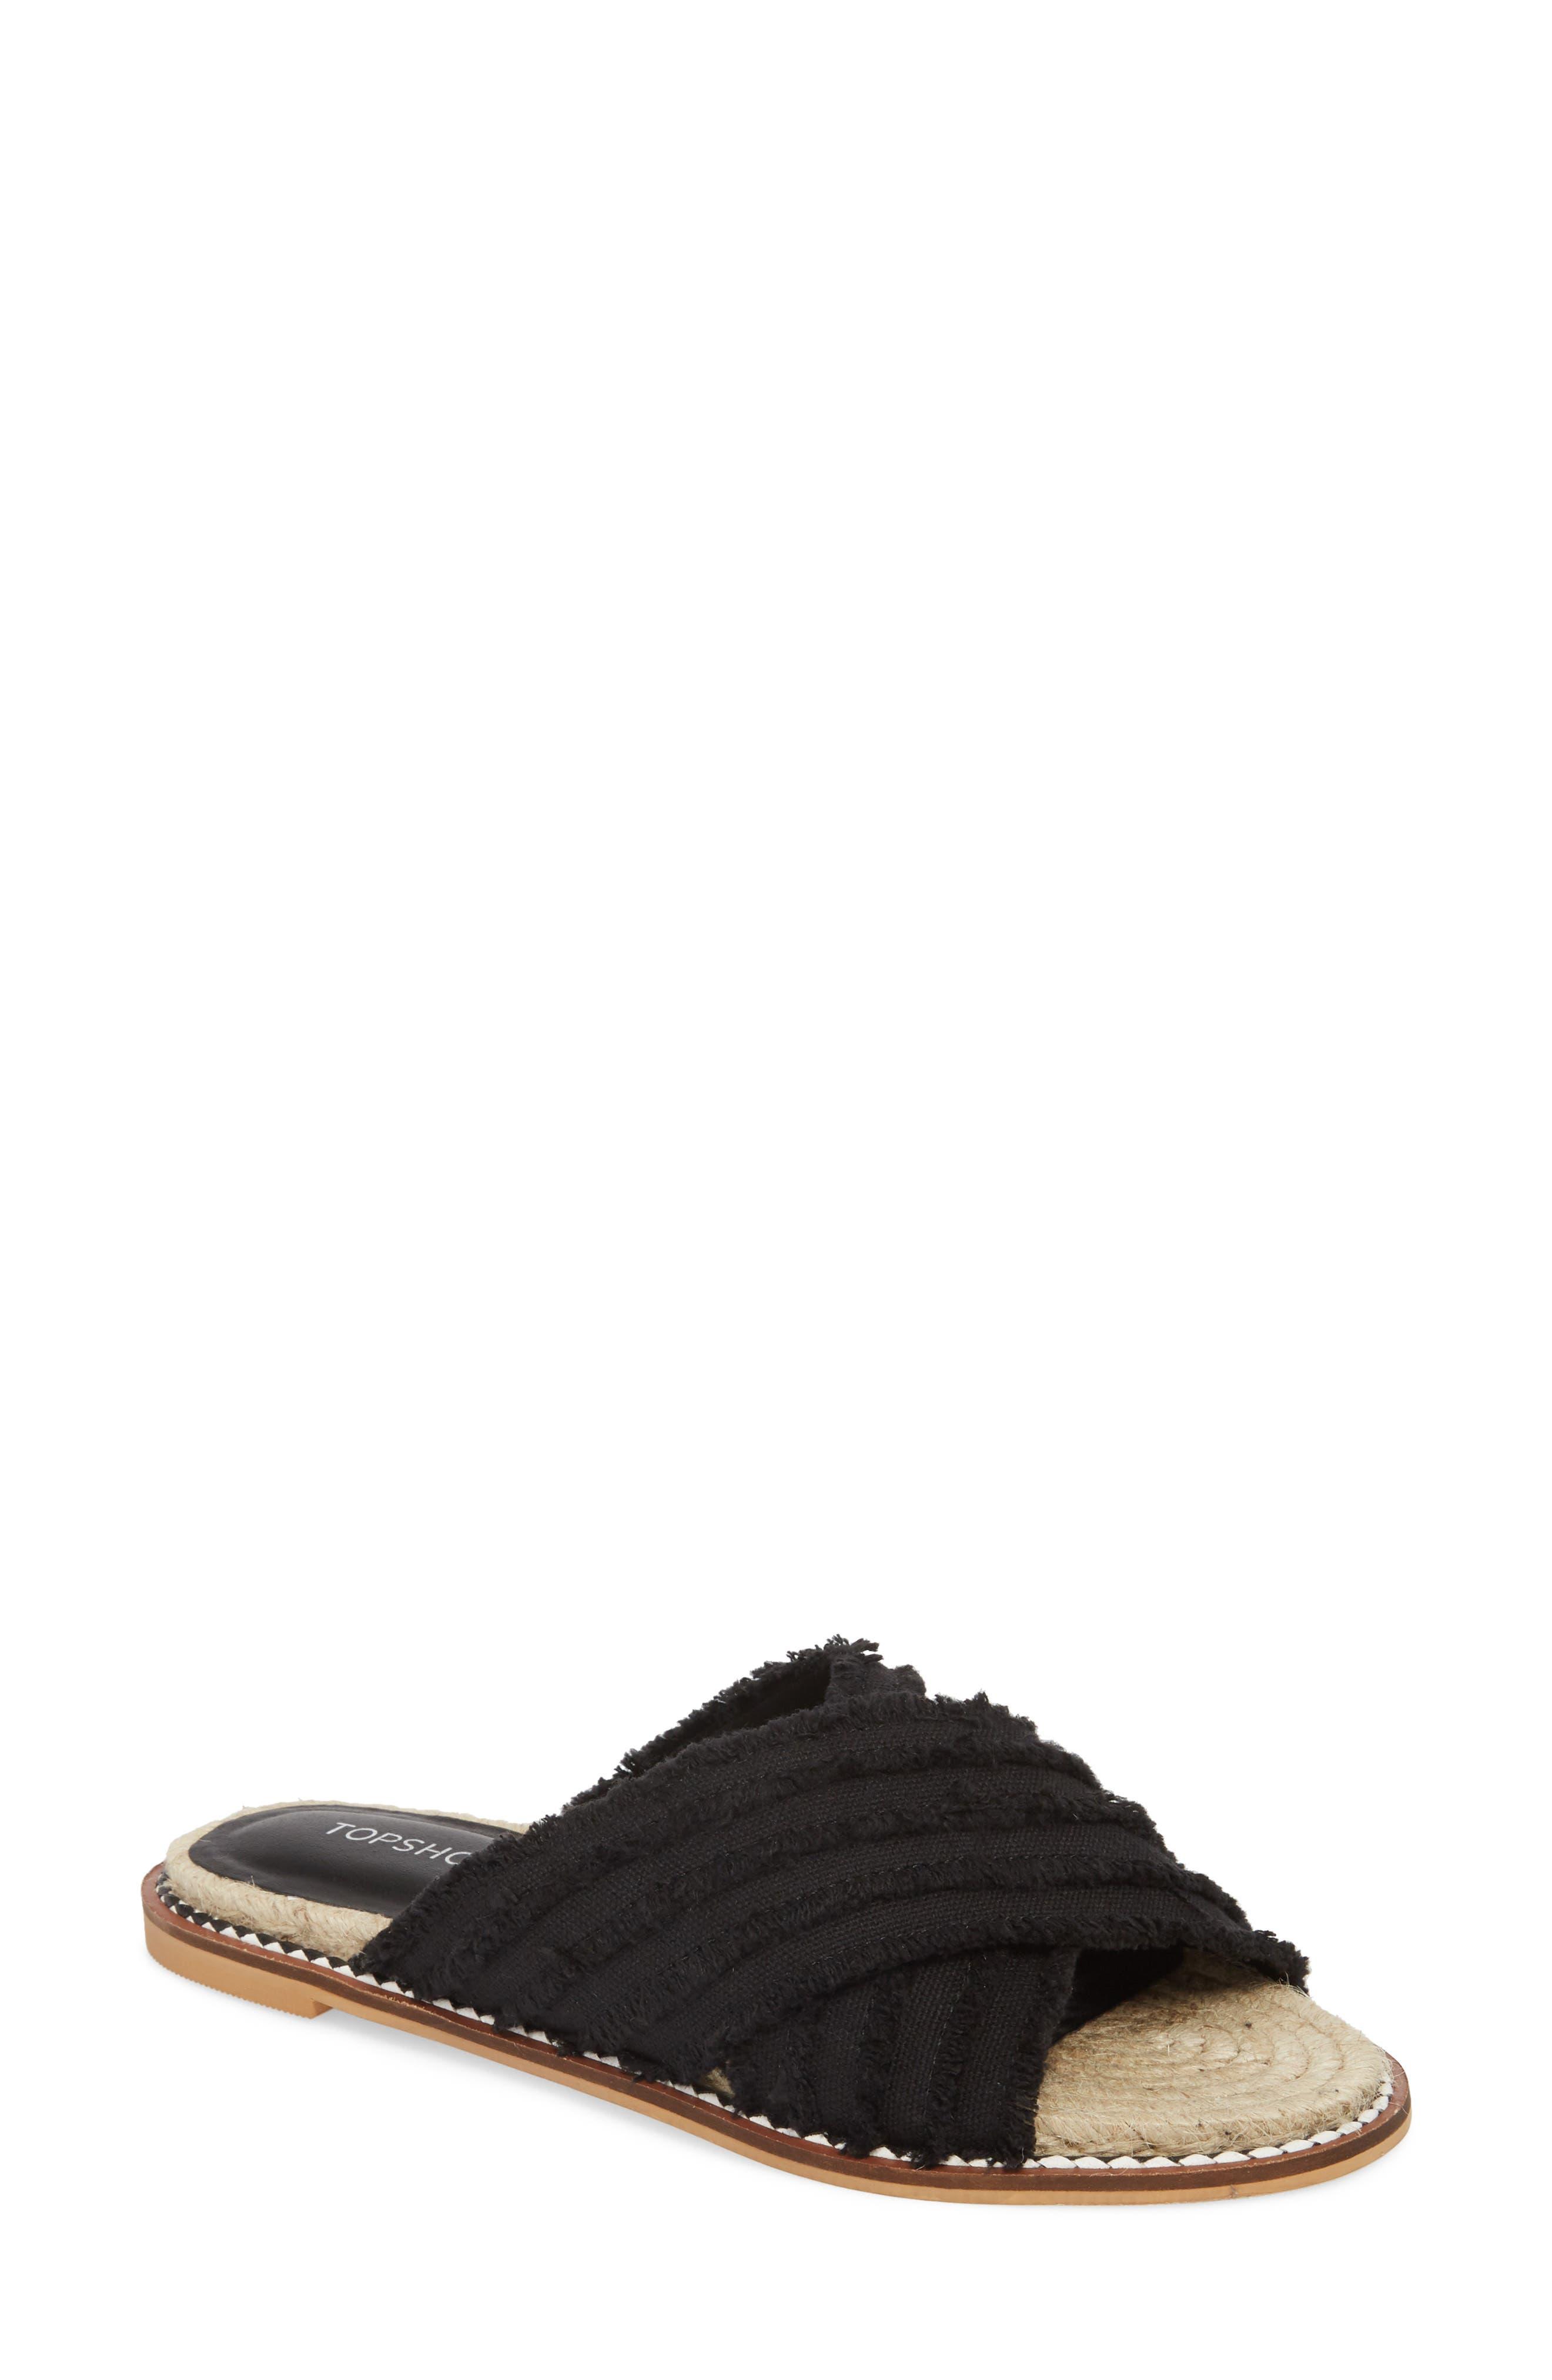 Hibiscus Slide Sandal,                         Main,                         color,